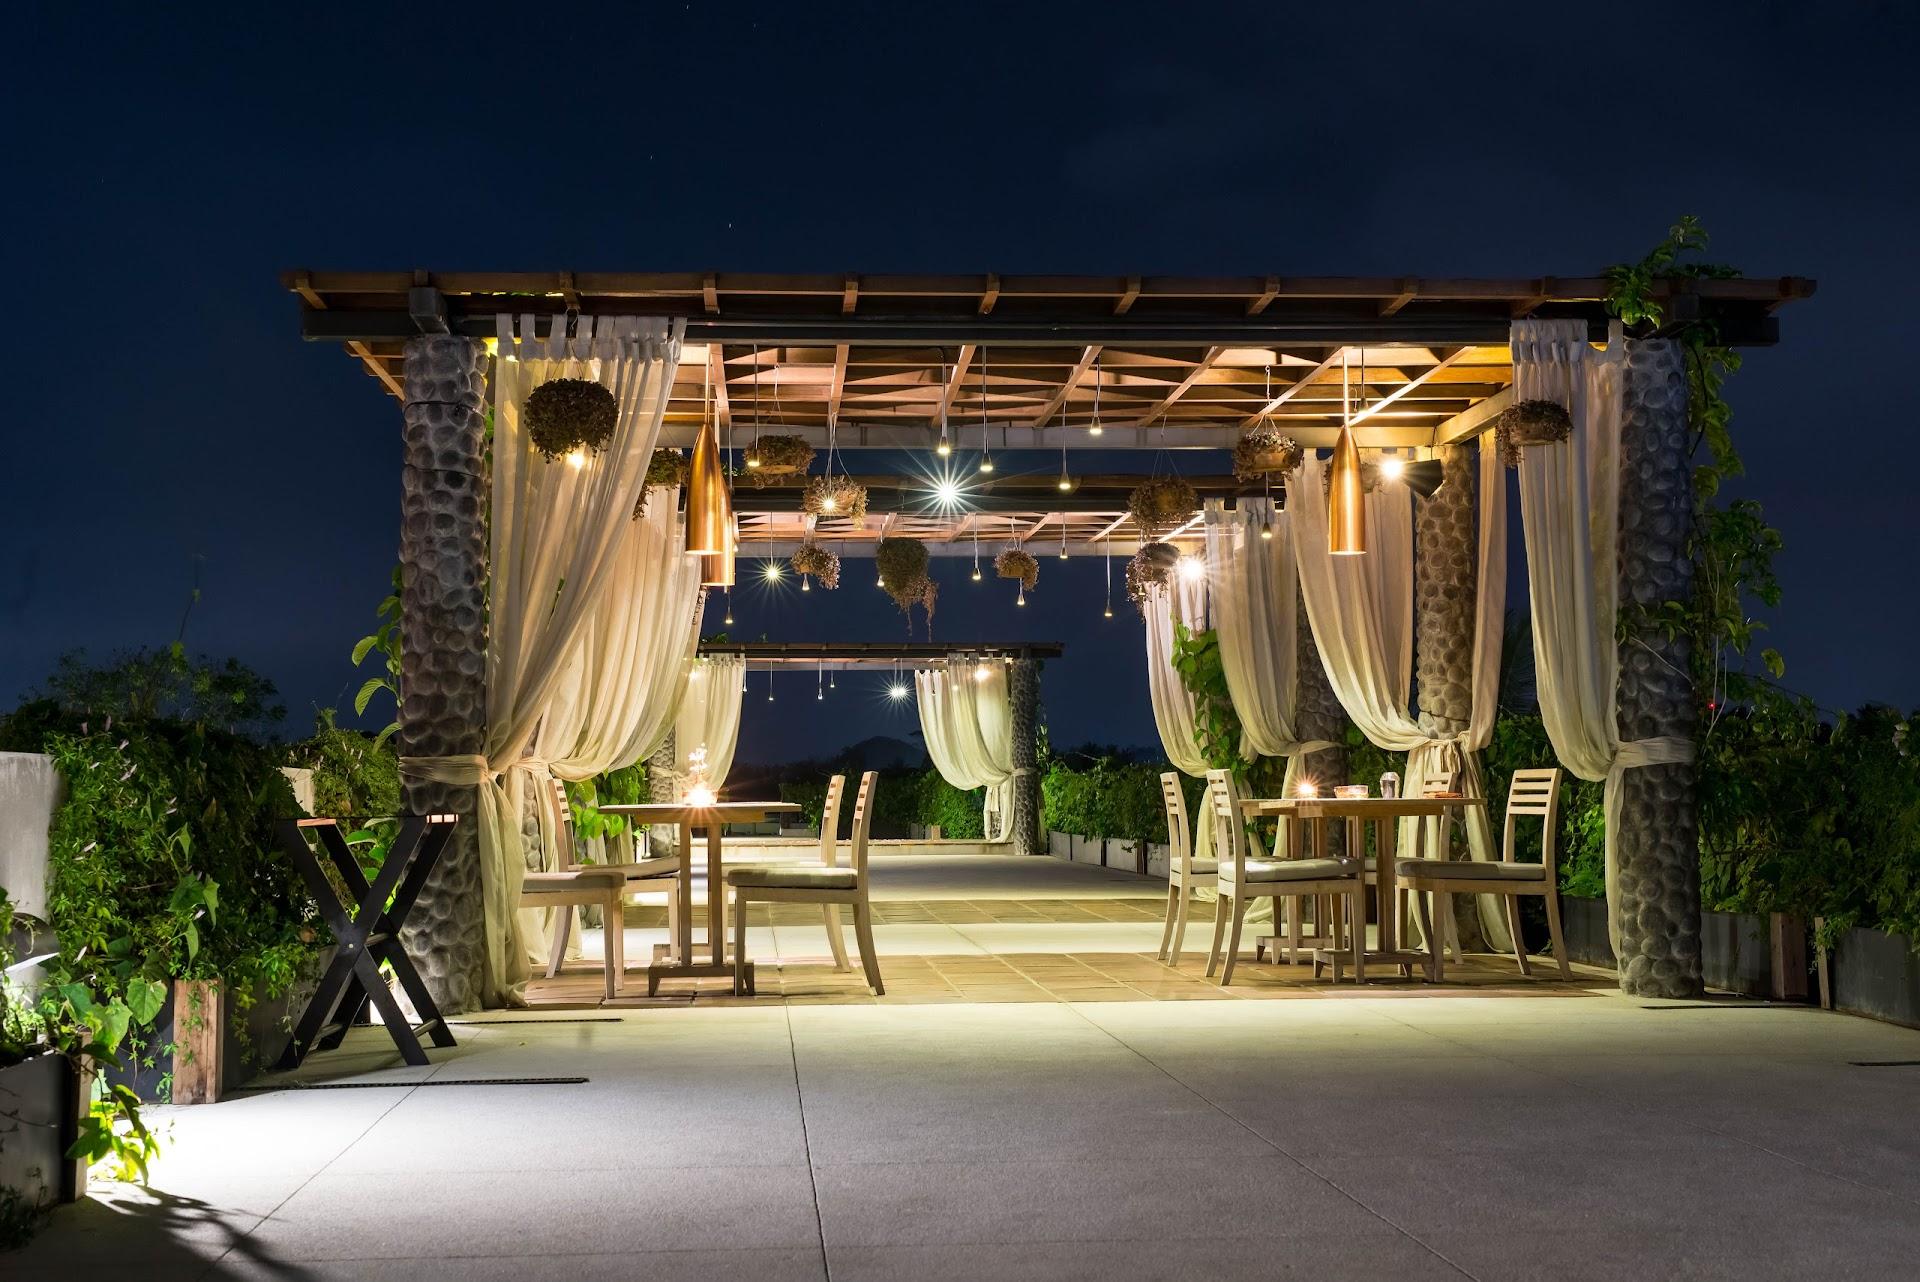 ubud bali best restaurants, fine dining, best value, gourmet food for cheap, romantic evening dinner, honeymoon spot, restaurant, asian fusion, outdoor, travel blog, indonesia, san francisco bay area travel blogger, couple, lds mormon, best honeymoon hotel resort